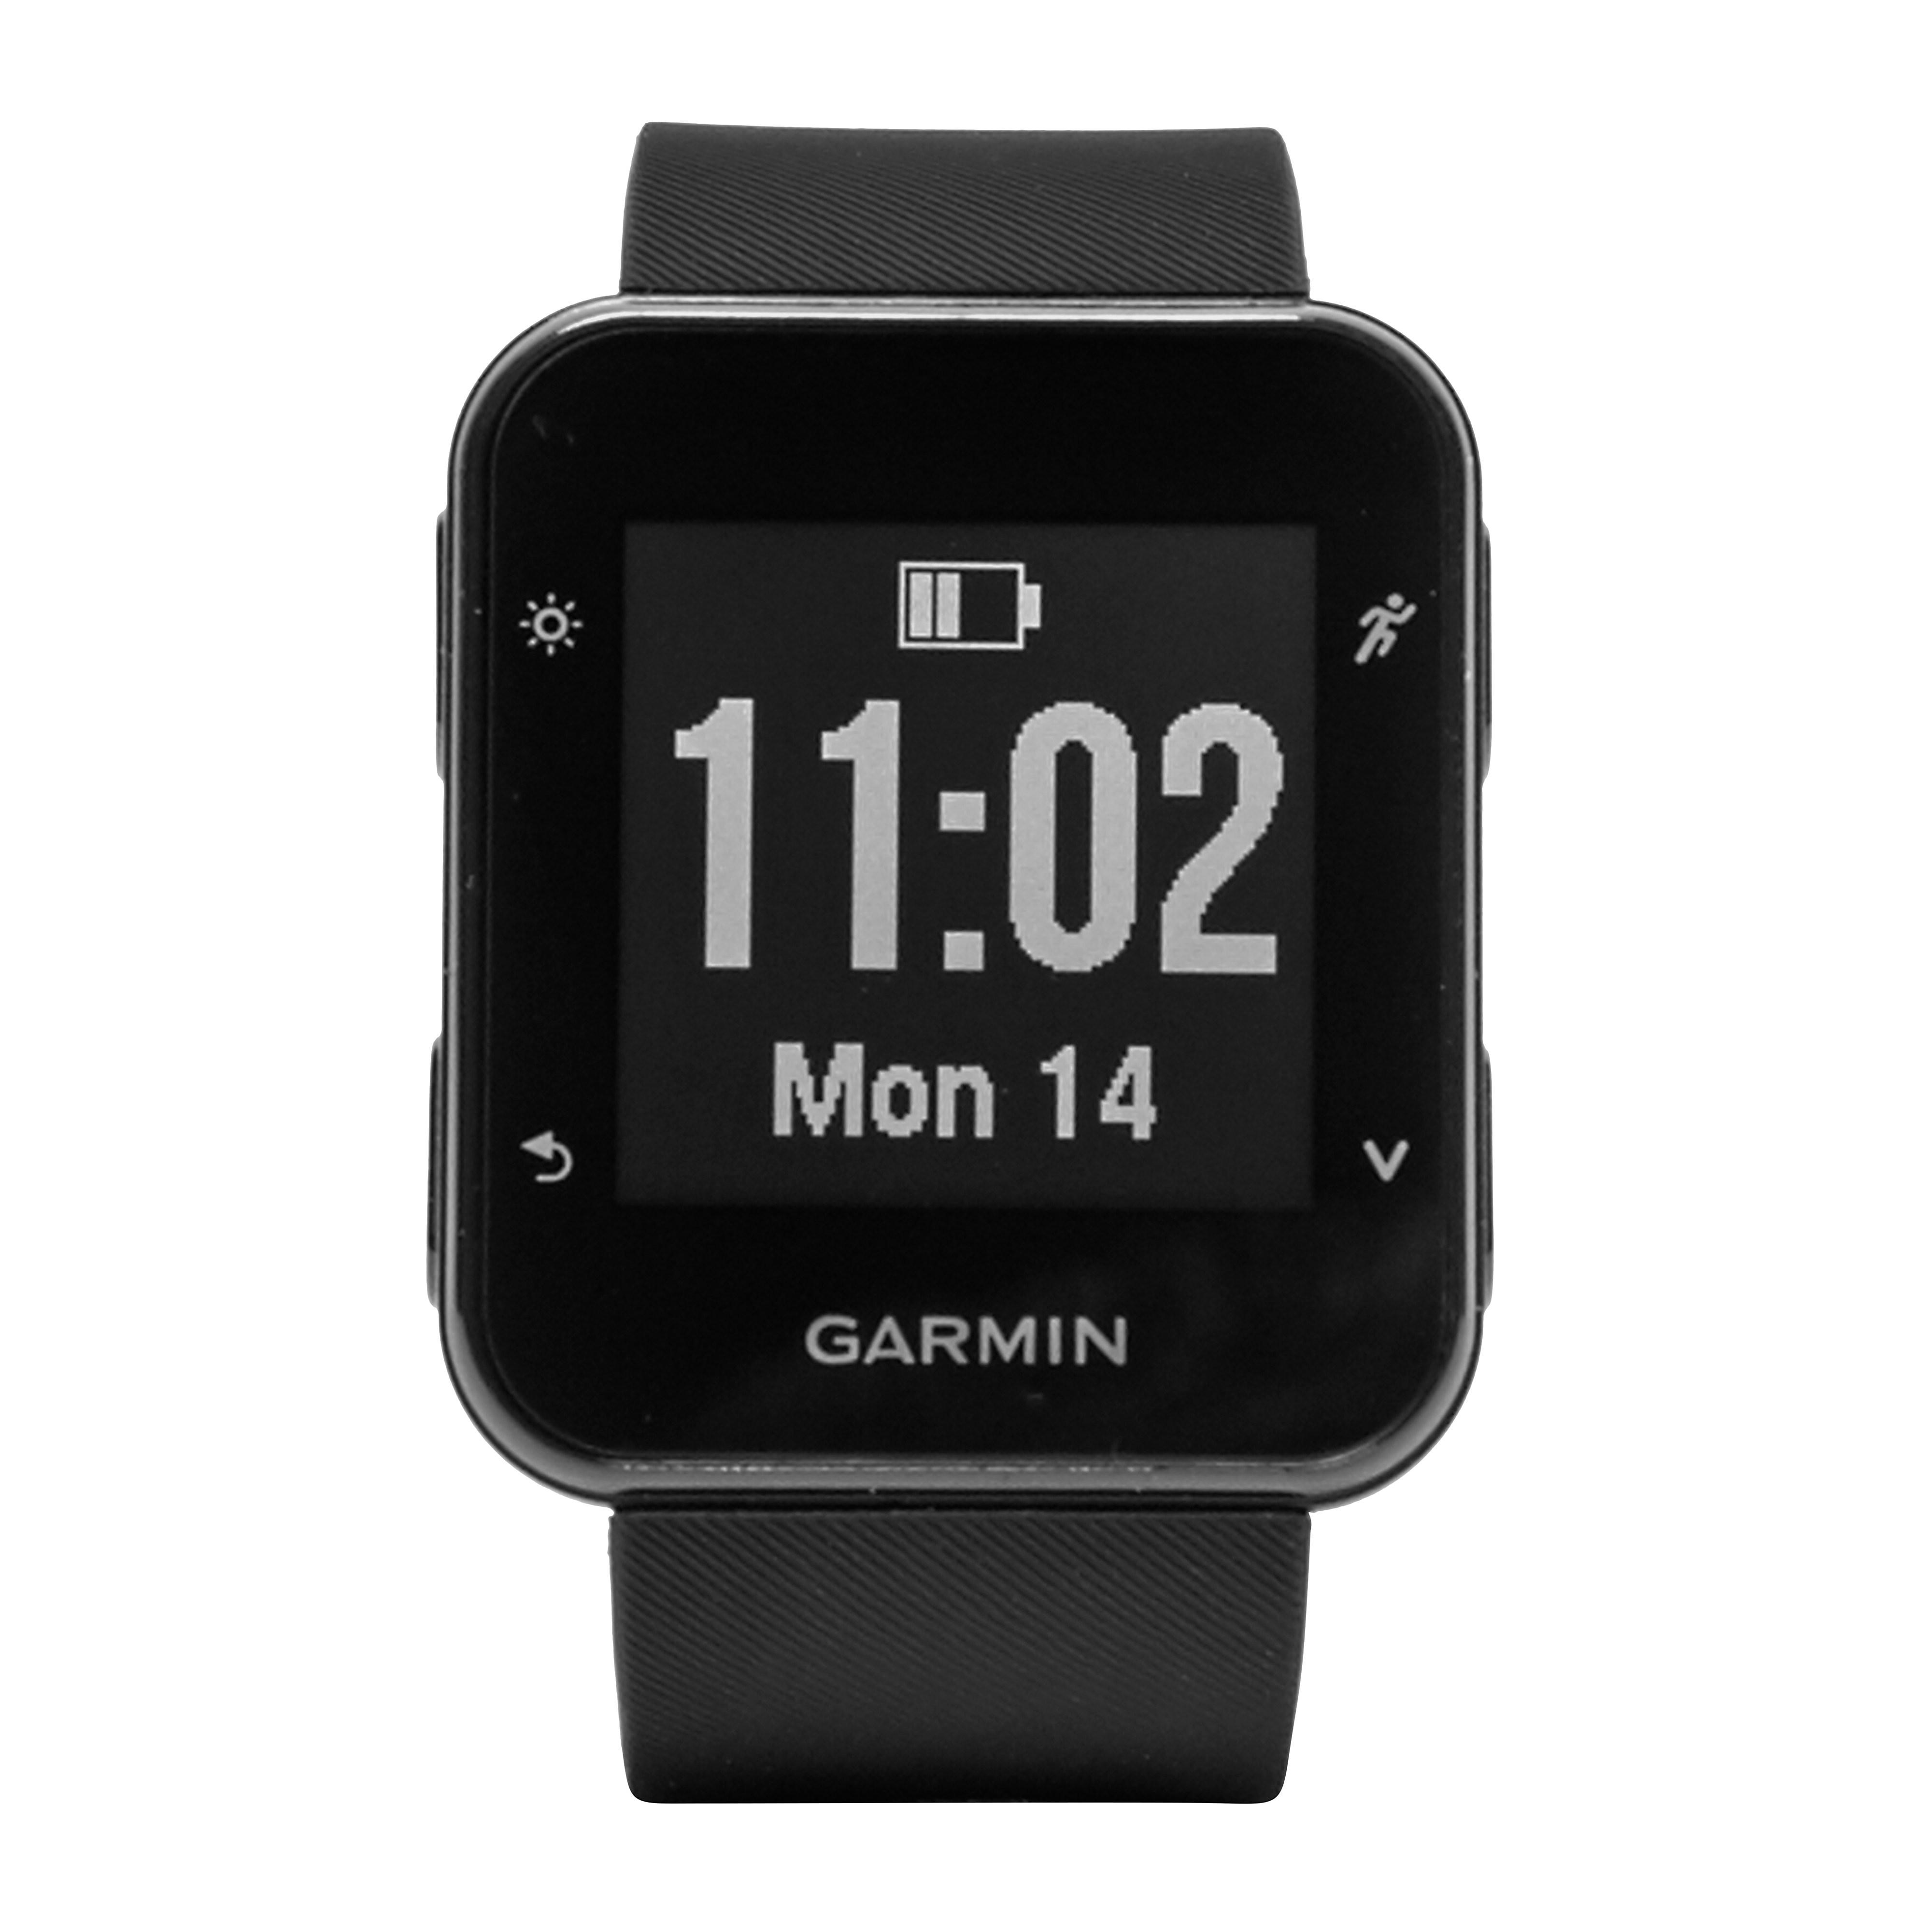 Garmin Forerunner 35 Multi-Sport Watch